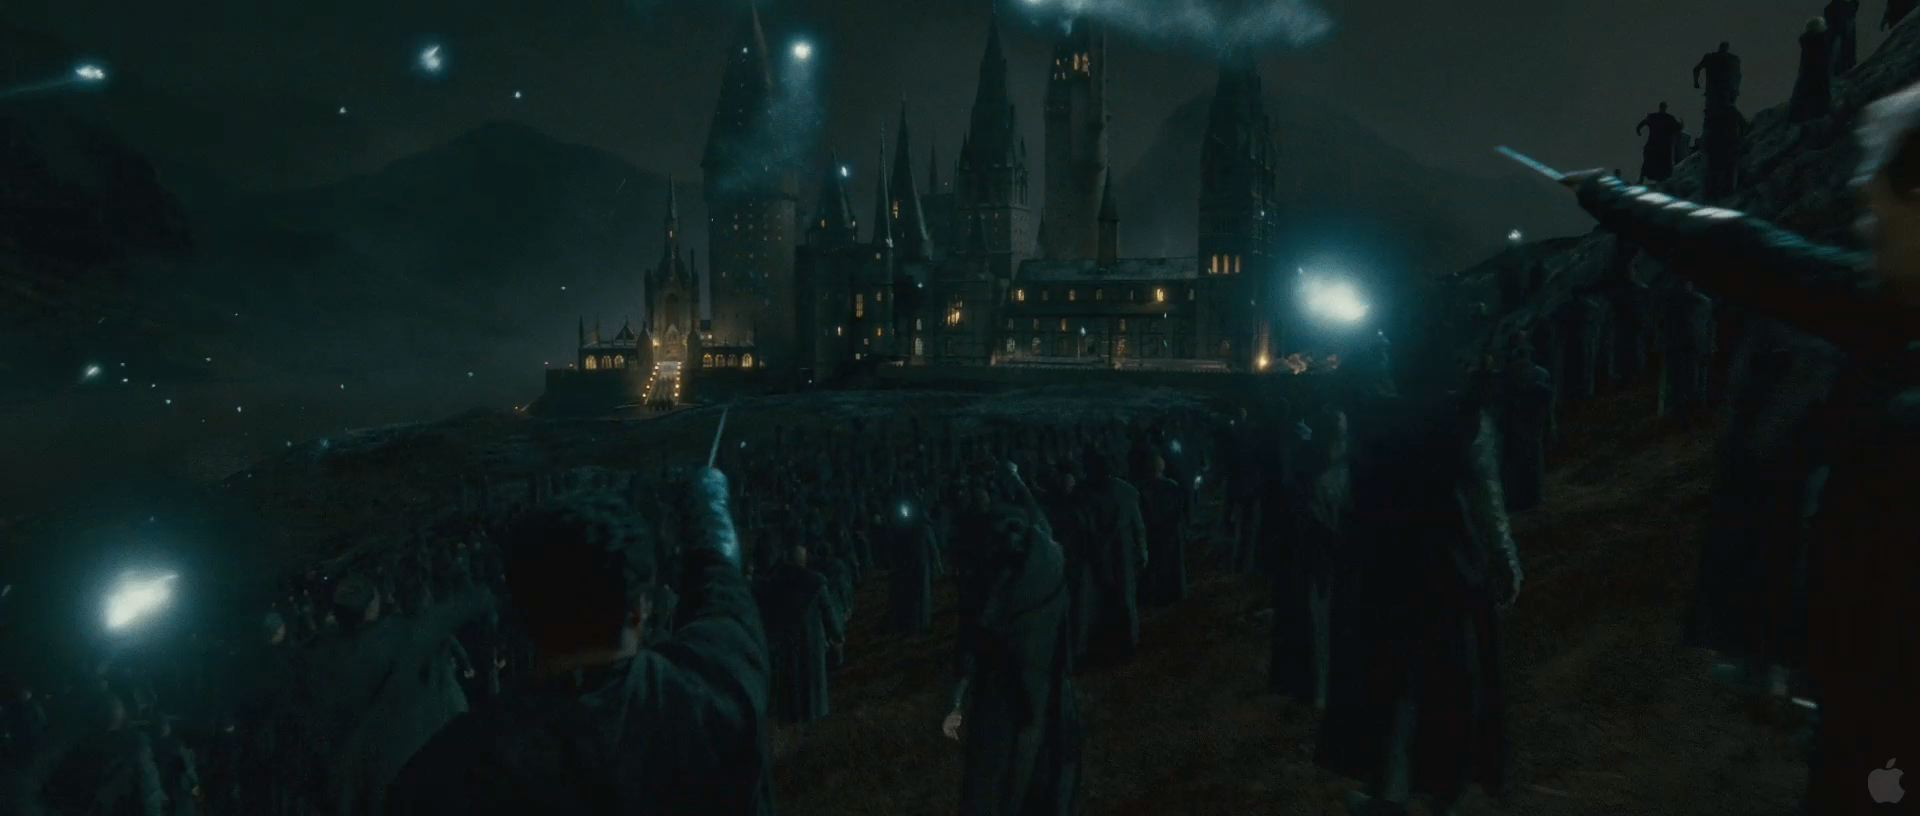 Harry Potter BlogHogwarts HP7 2 Trailer 87